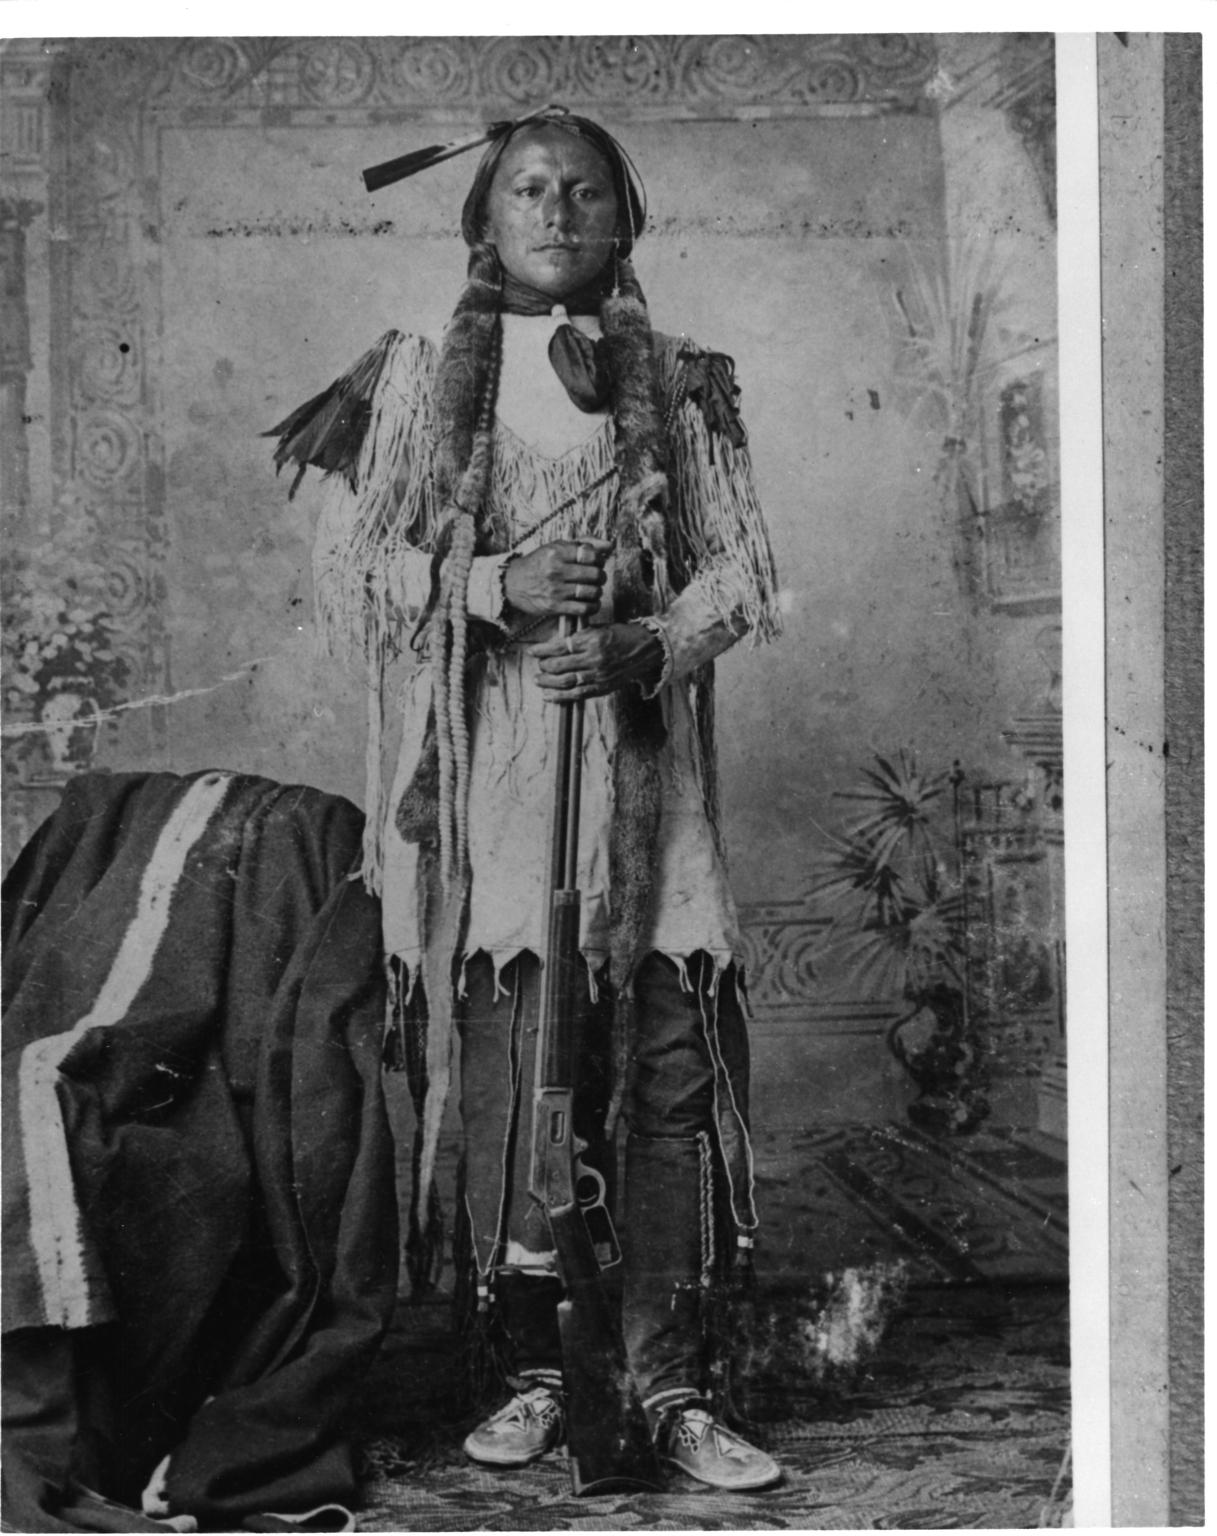 Comanche man